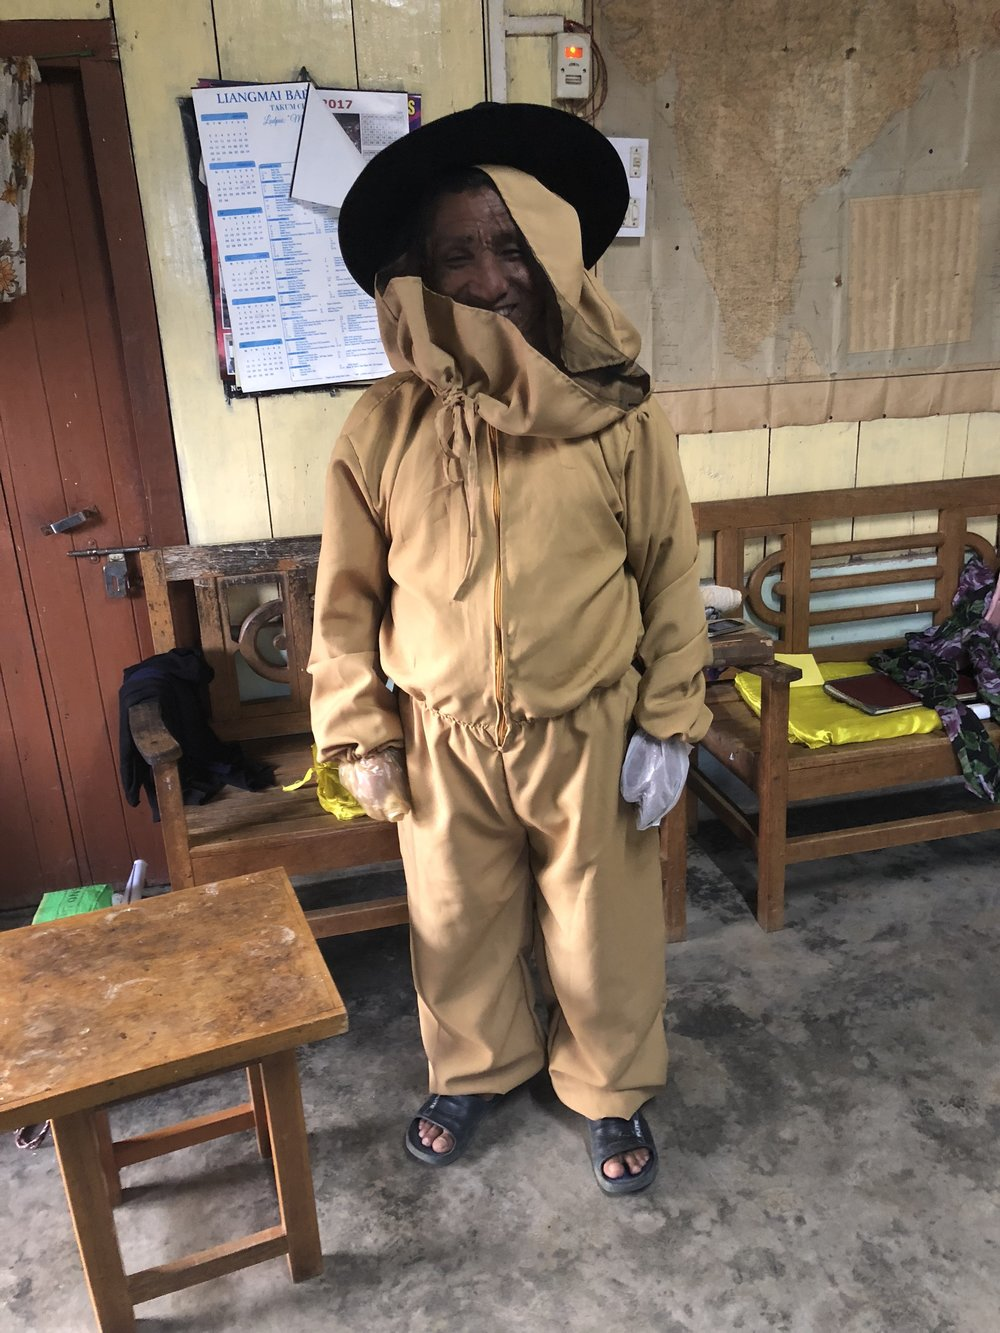 A local beekeeper